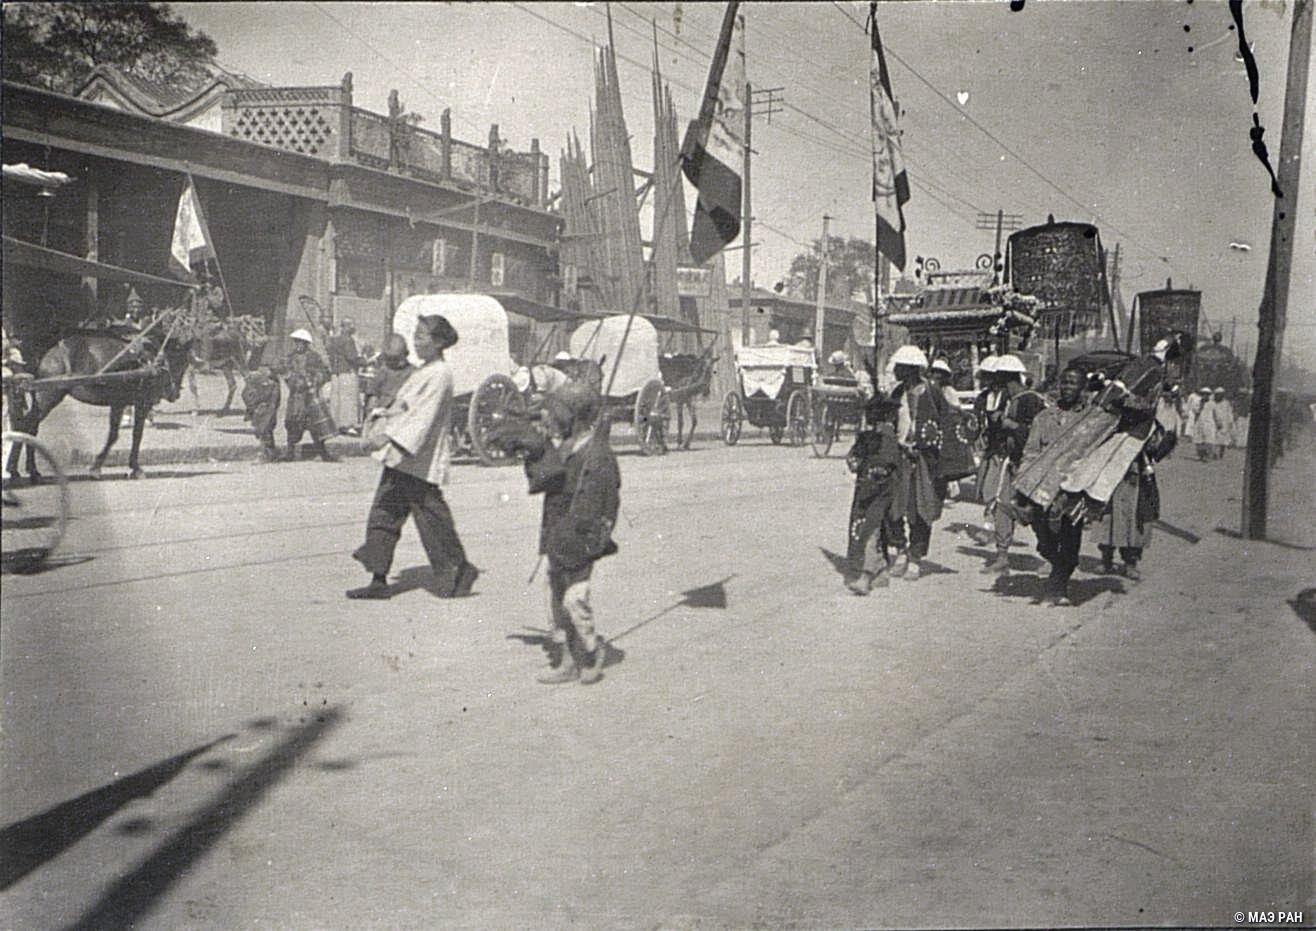 Похоронная процессия на улицах Пекина